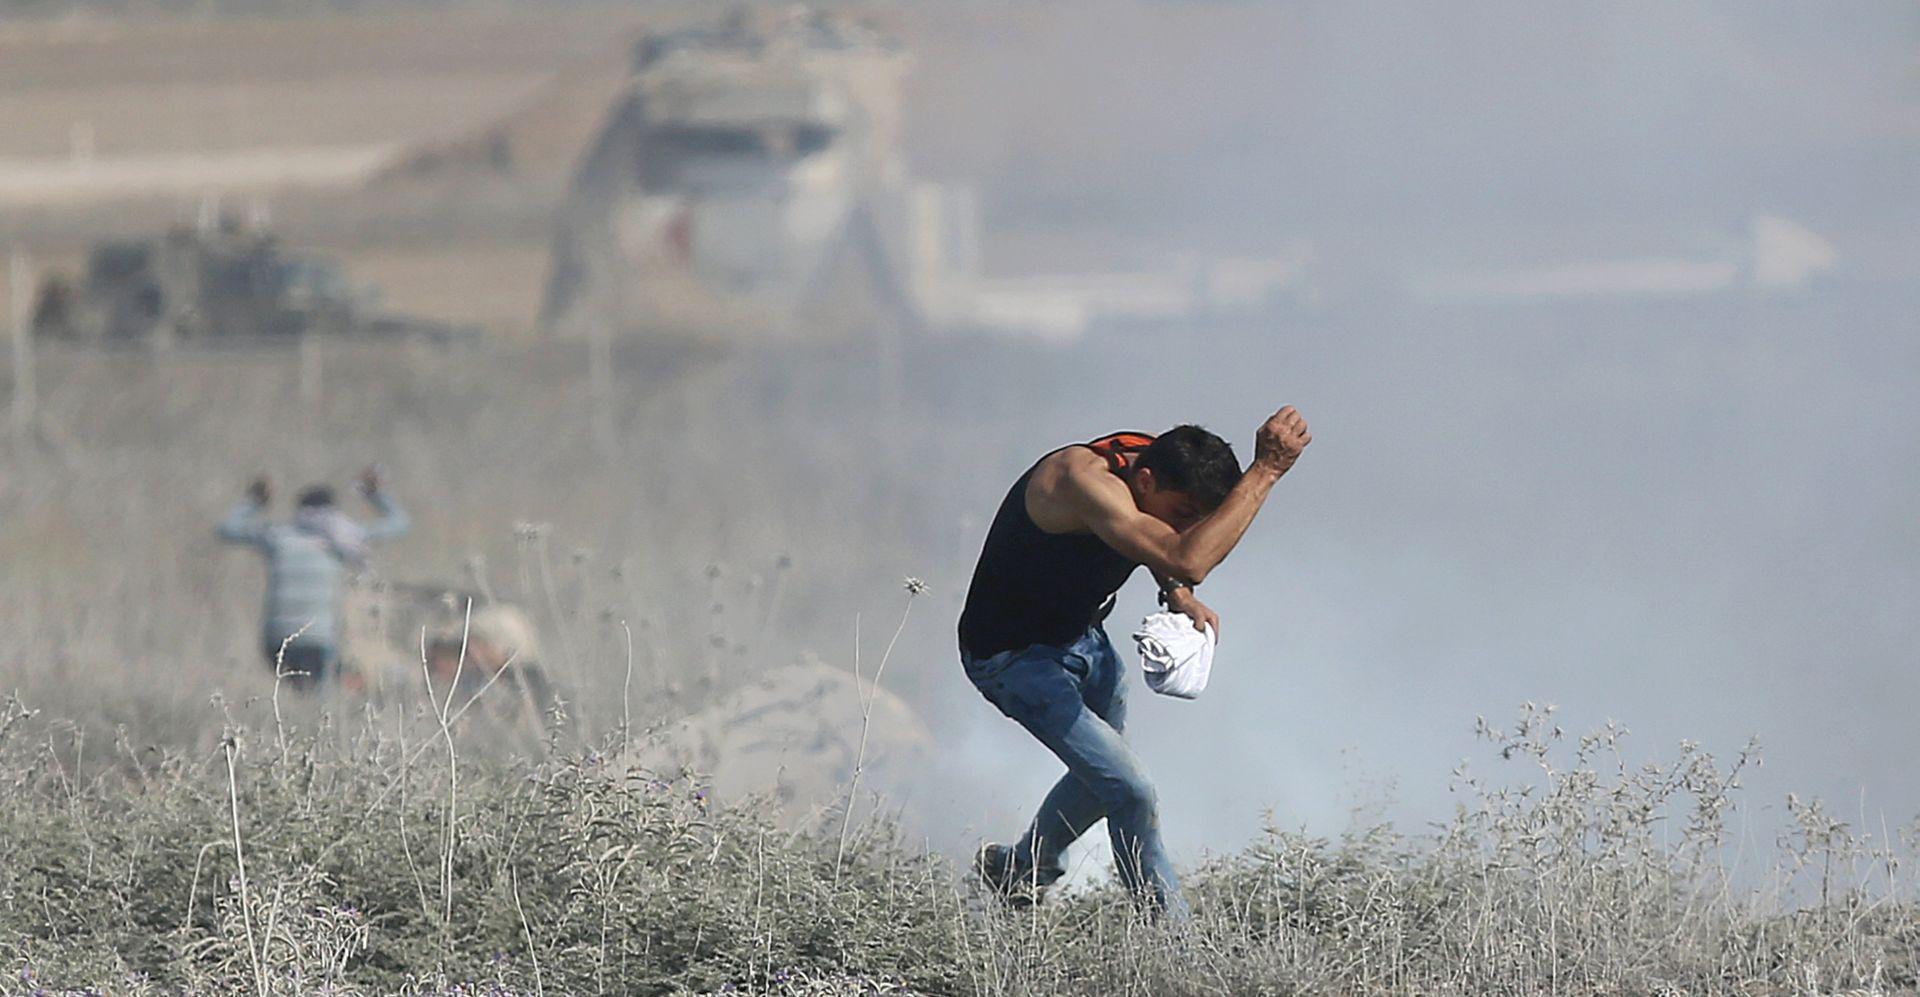 Turska i Izrael zbog sukoba u Gazi protjerali diplomate